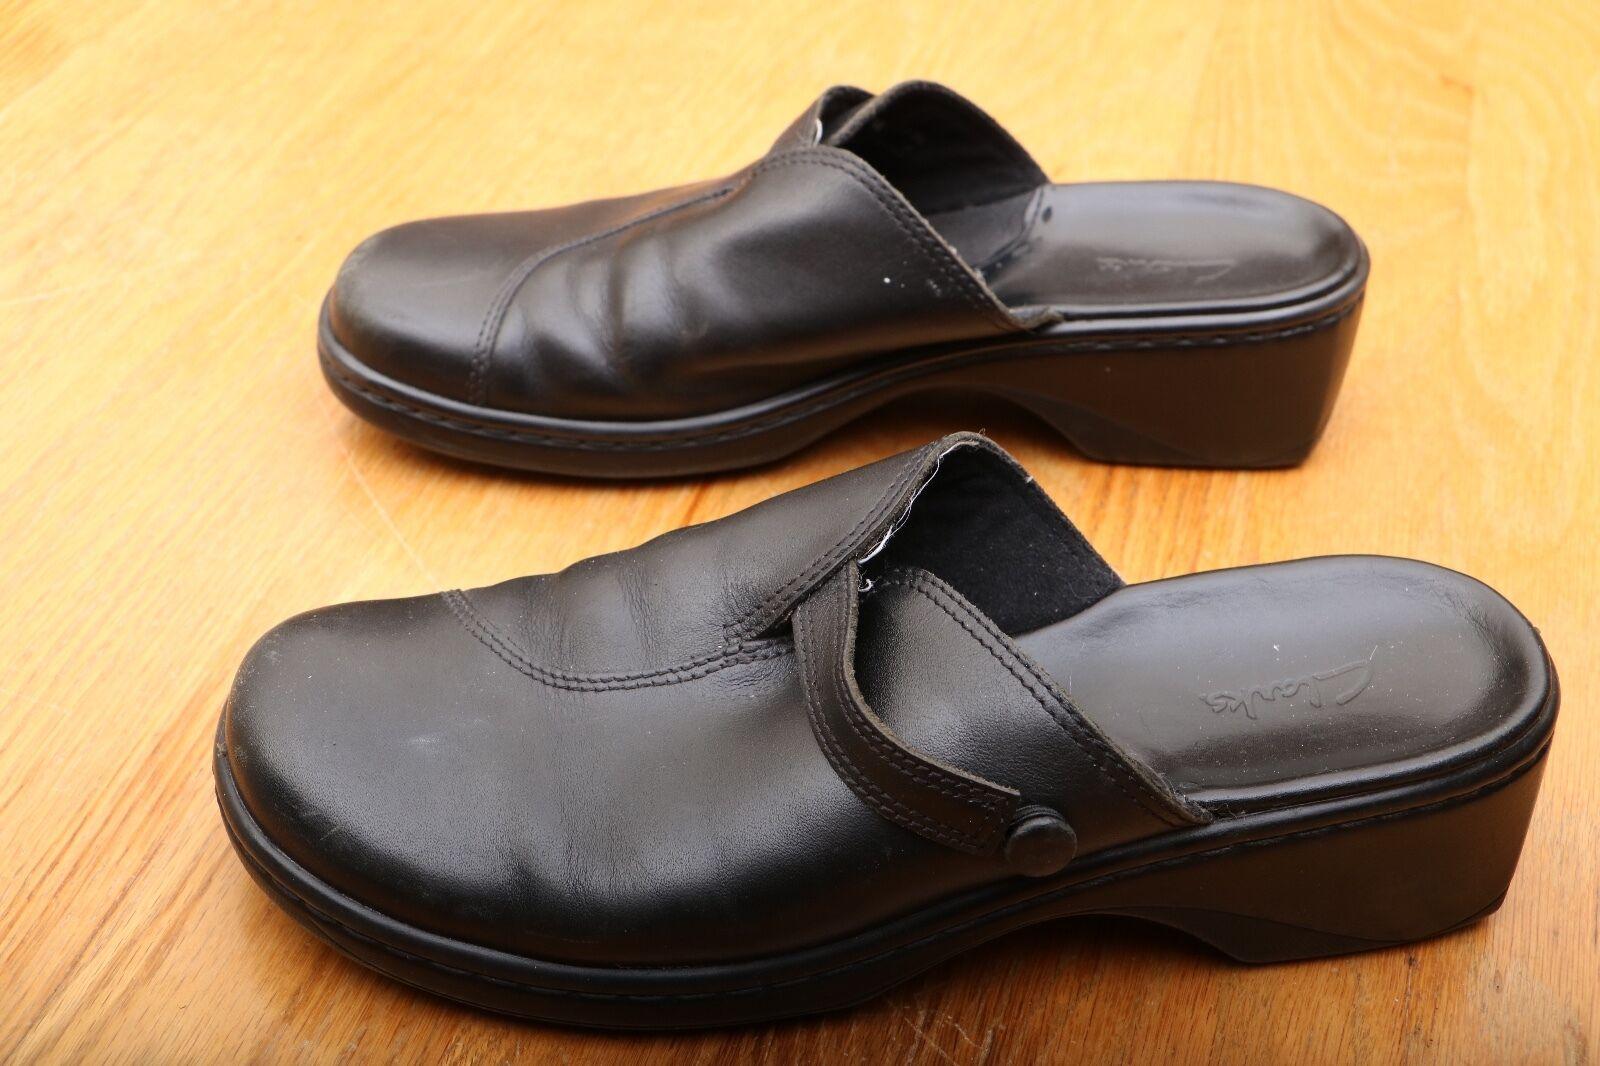 Clarks Black Mule Clogs Women's Size 7 M